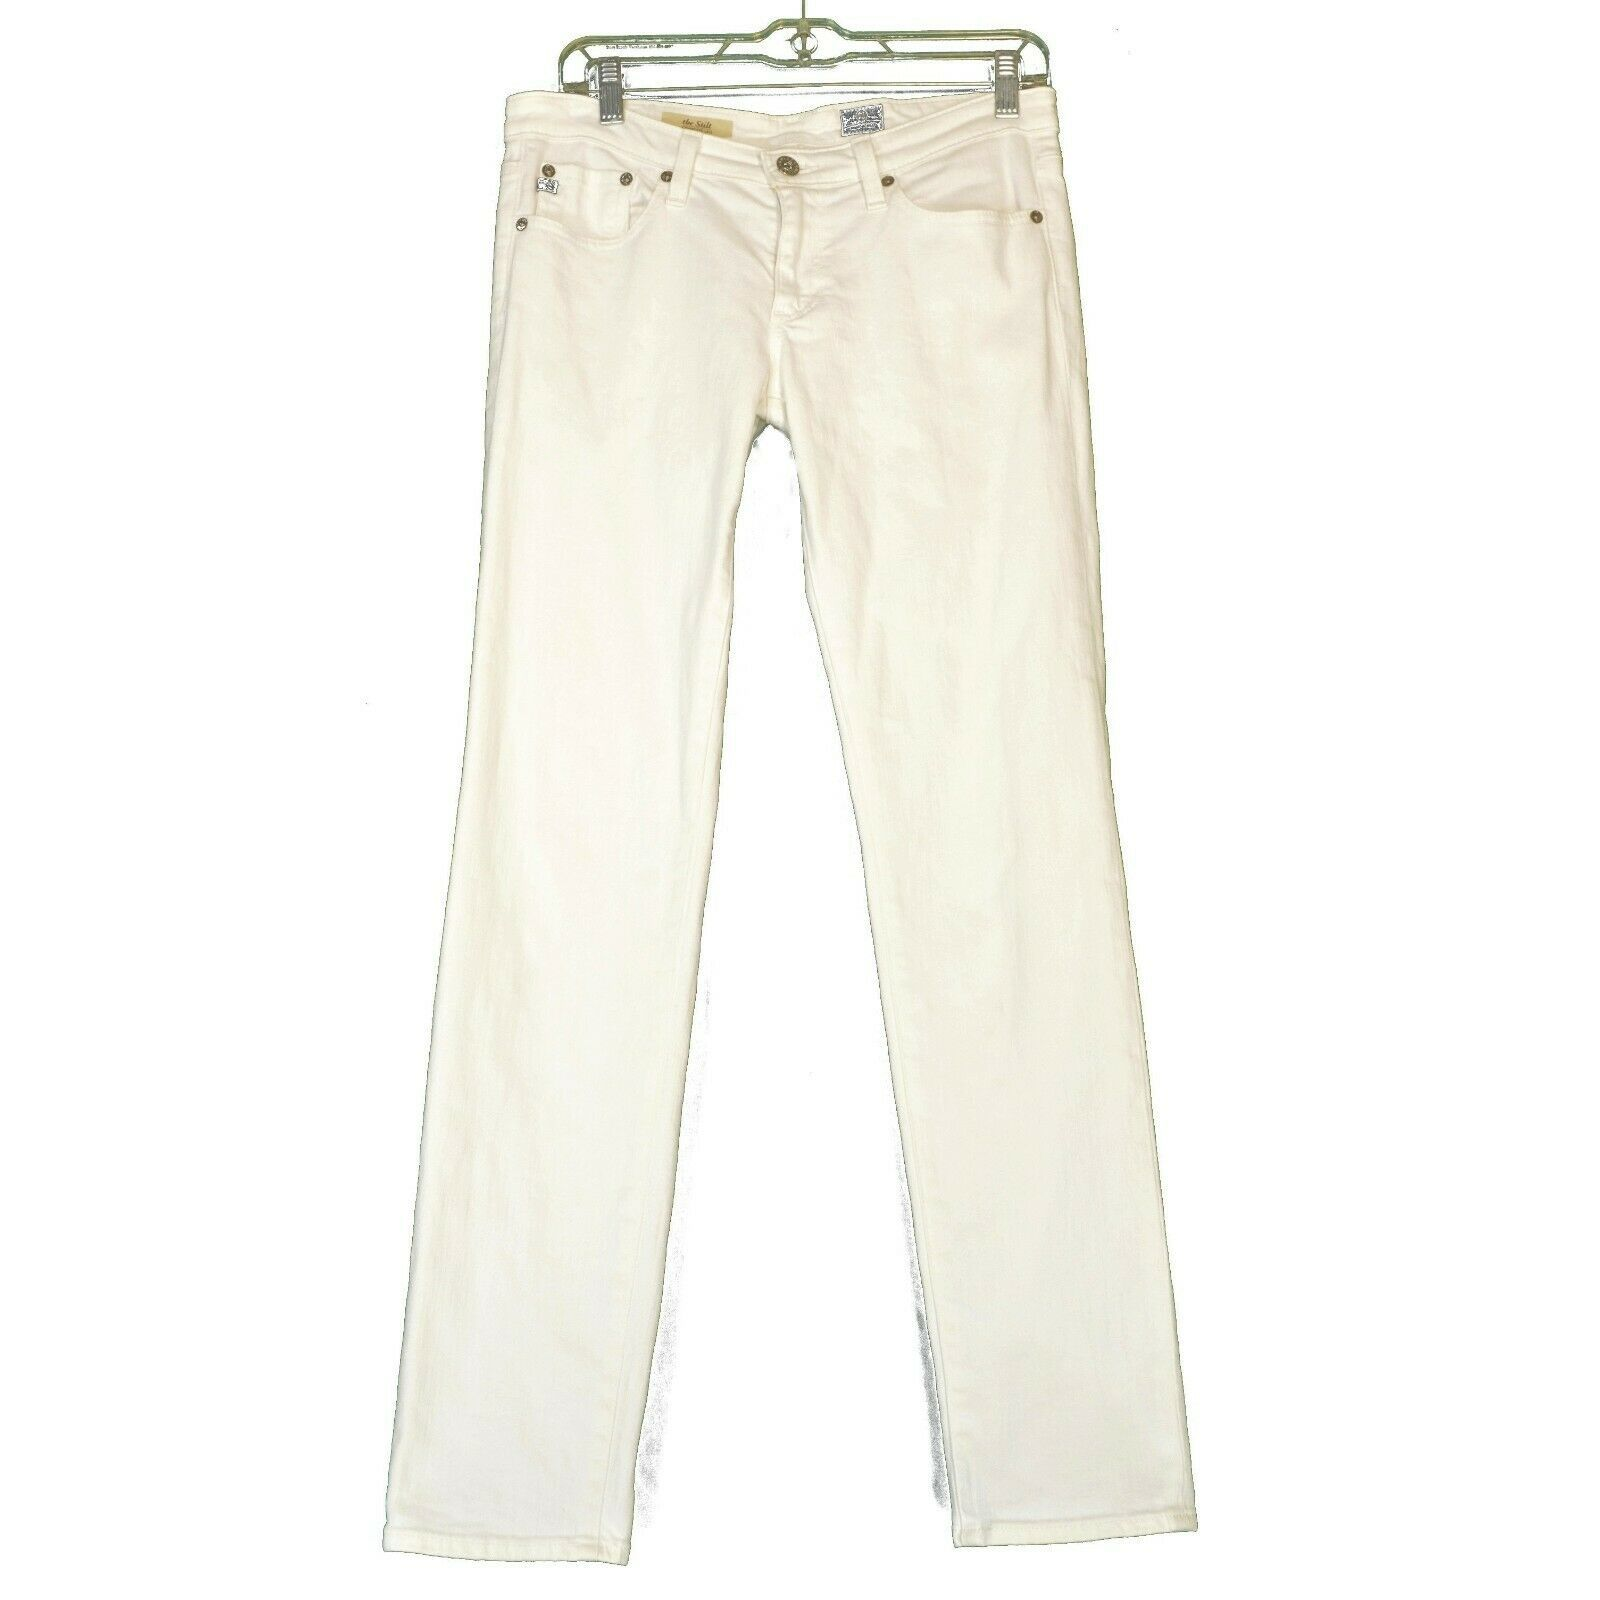 AG Adriano Goldschmied jeans 29 x 31 Stilt cigarette leg White thick EUCUSA image 10